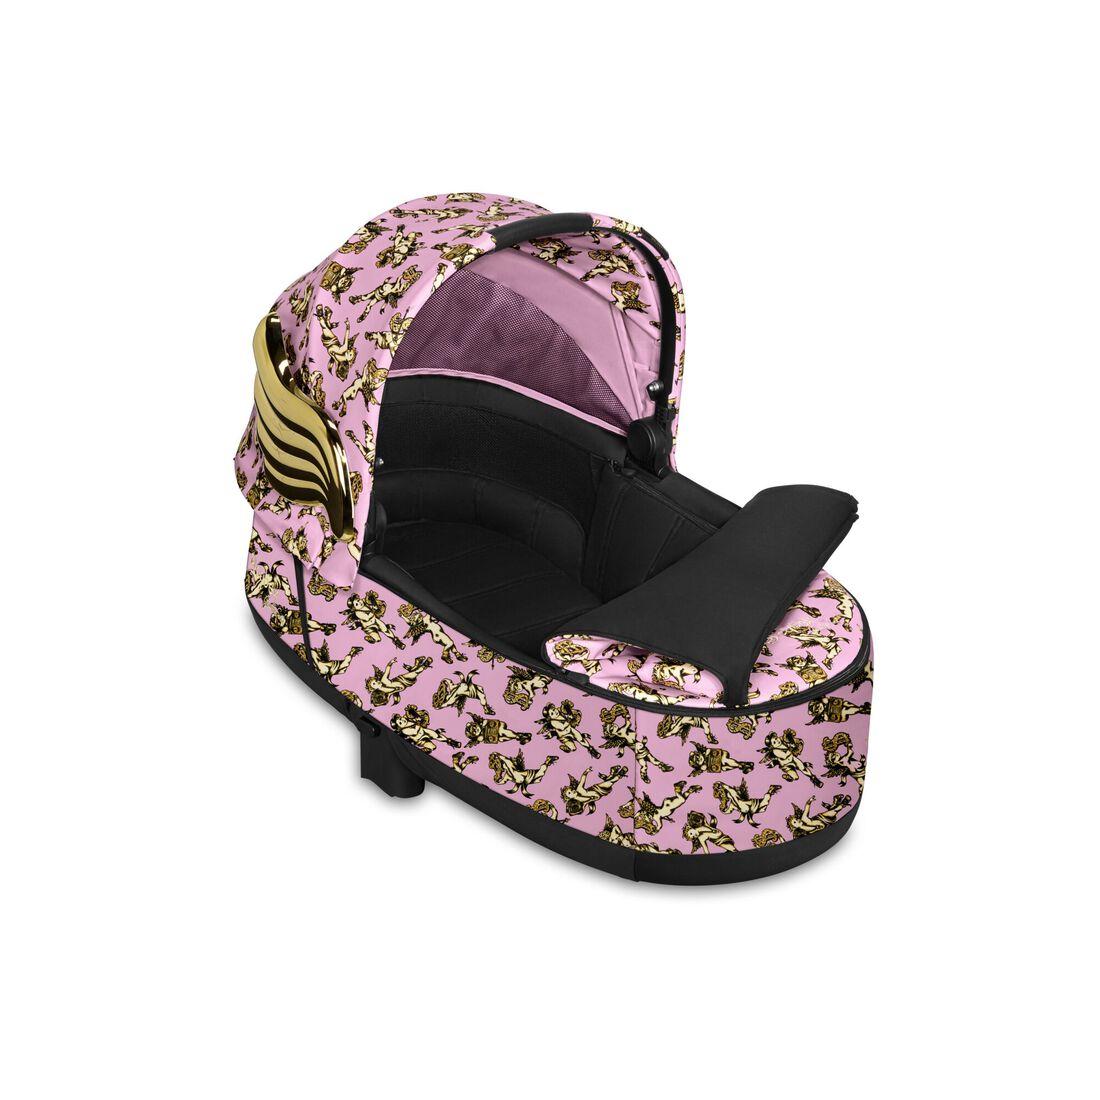 CYBEX Priam Lux Carry Cot - Cherubs Pink in Cherubs Pink large Bild 2